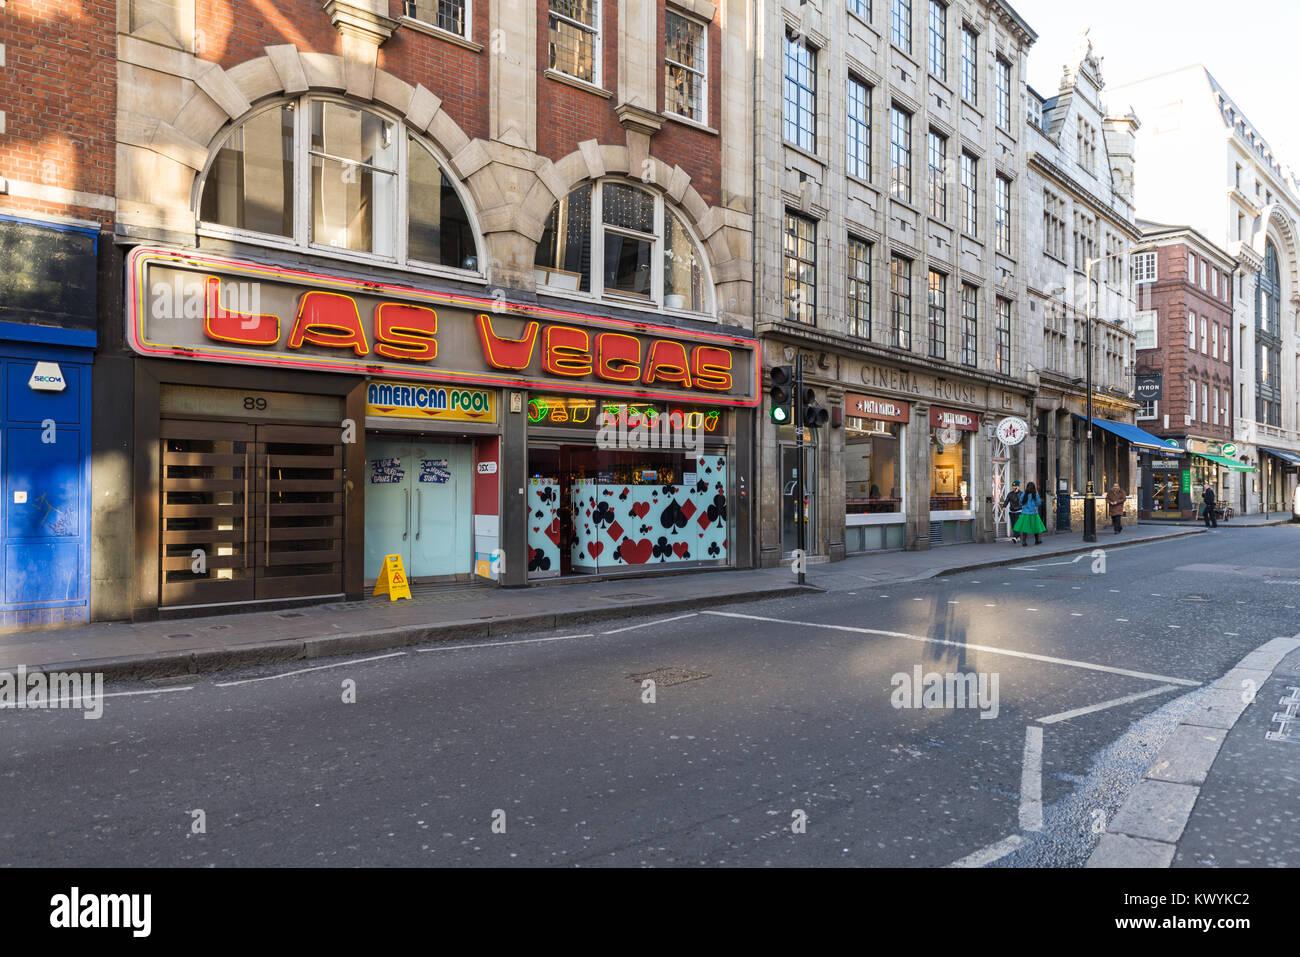 The Las Vegas Arcade in Wardour Street, Soho, London, England, UK. - Stock Image